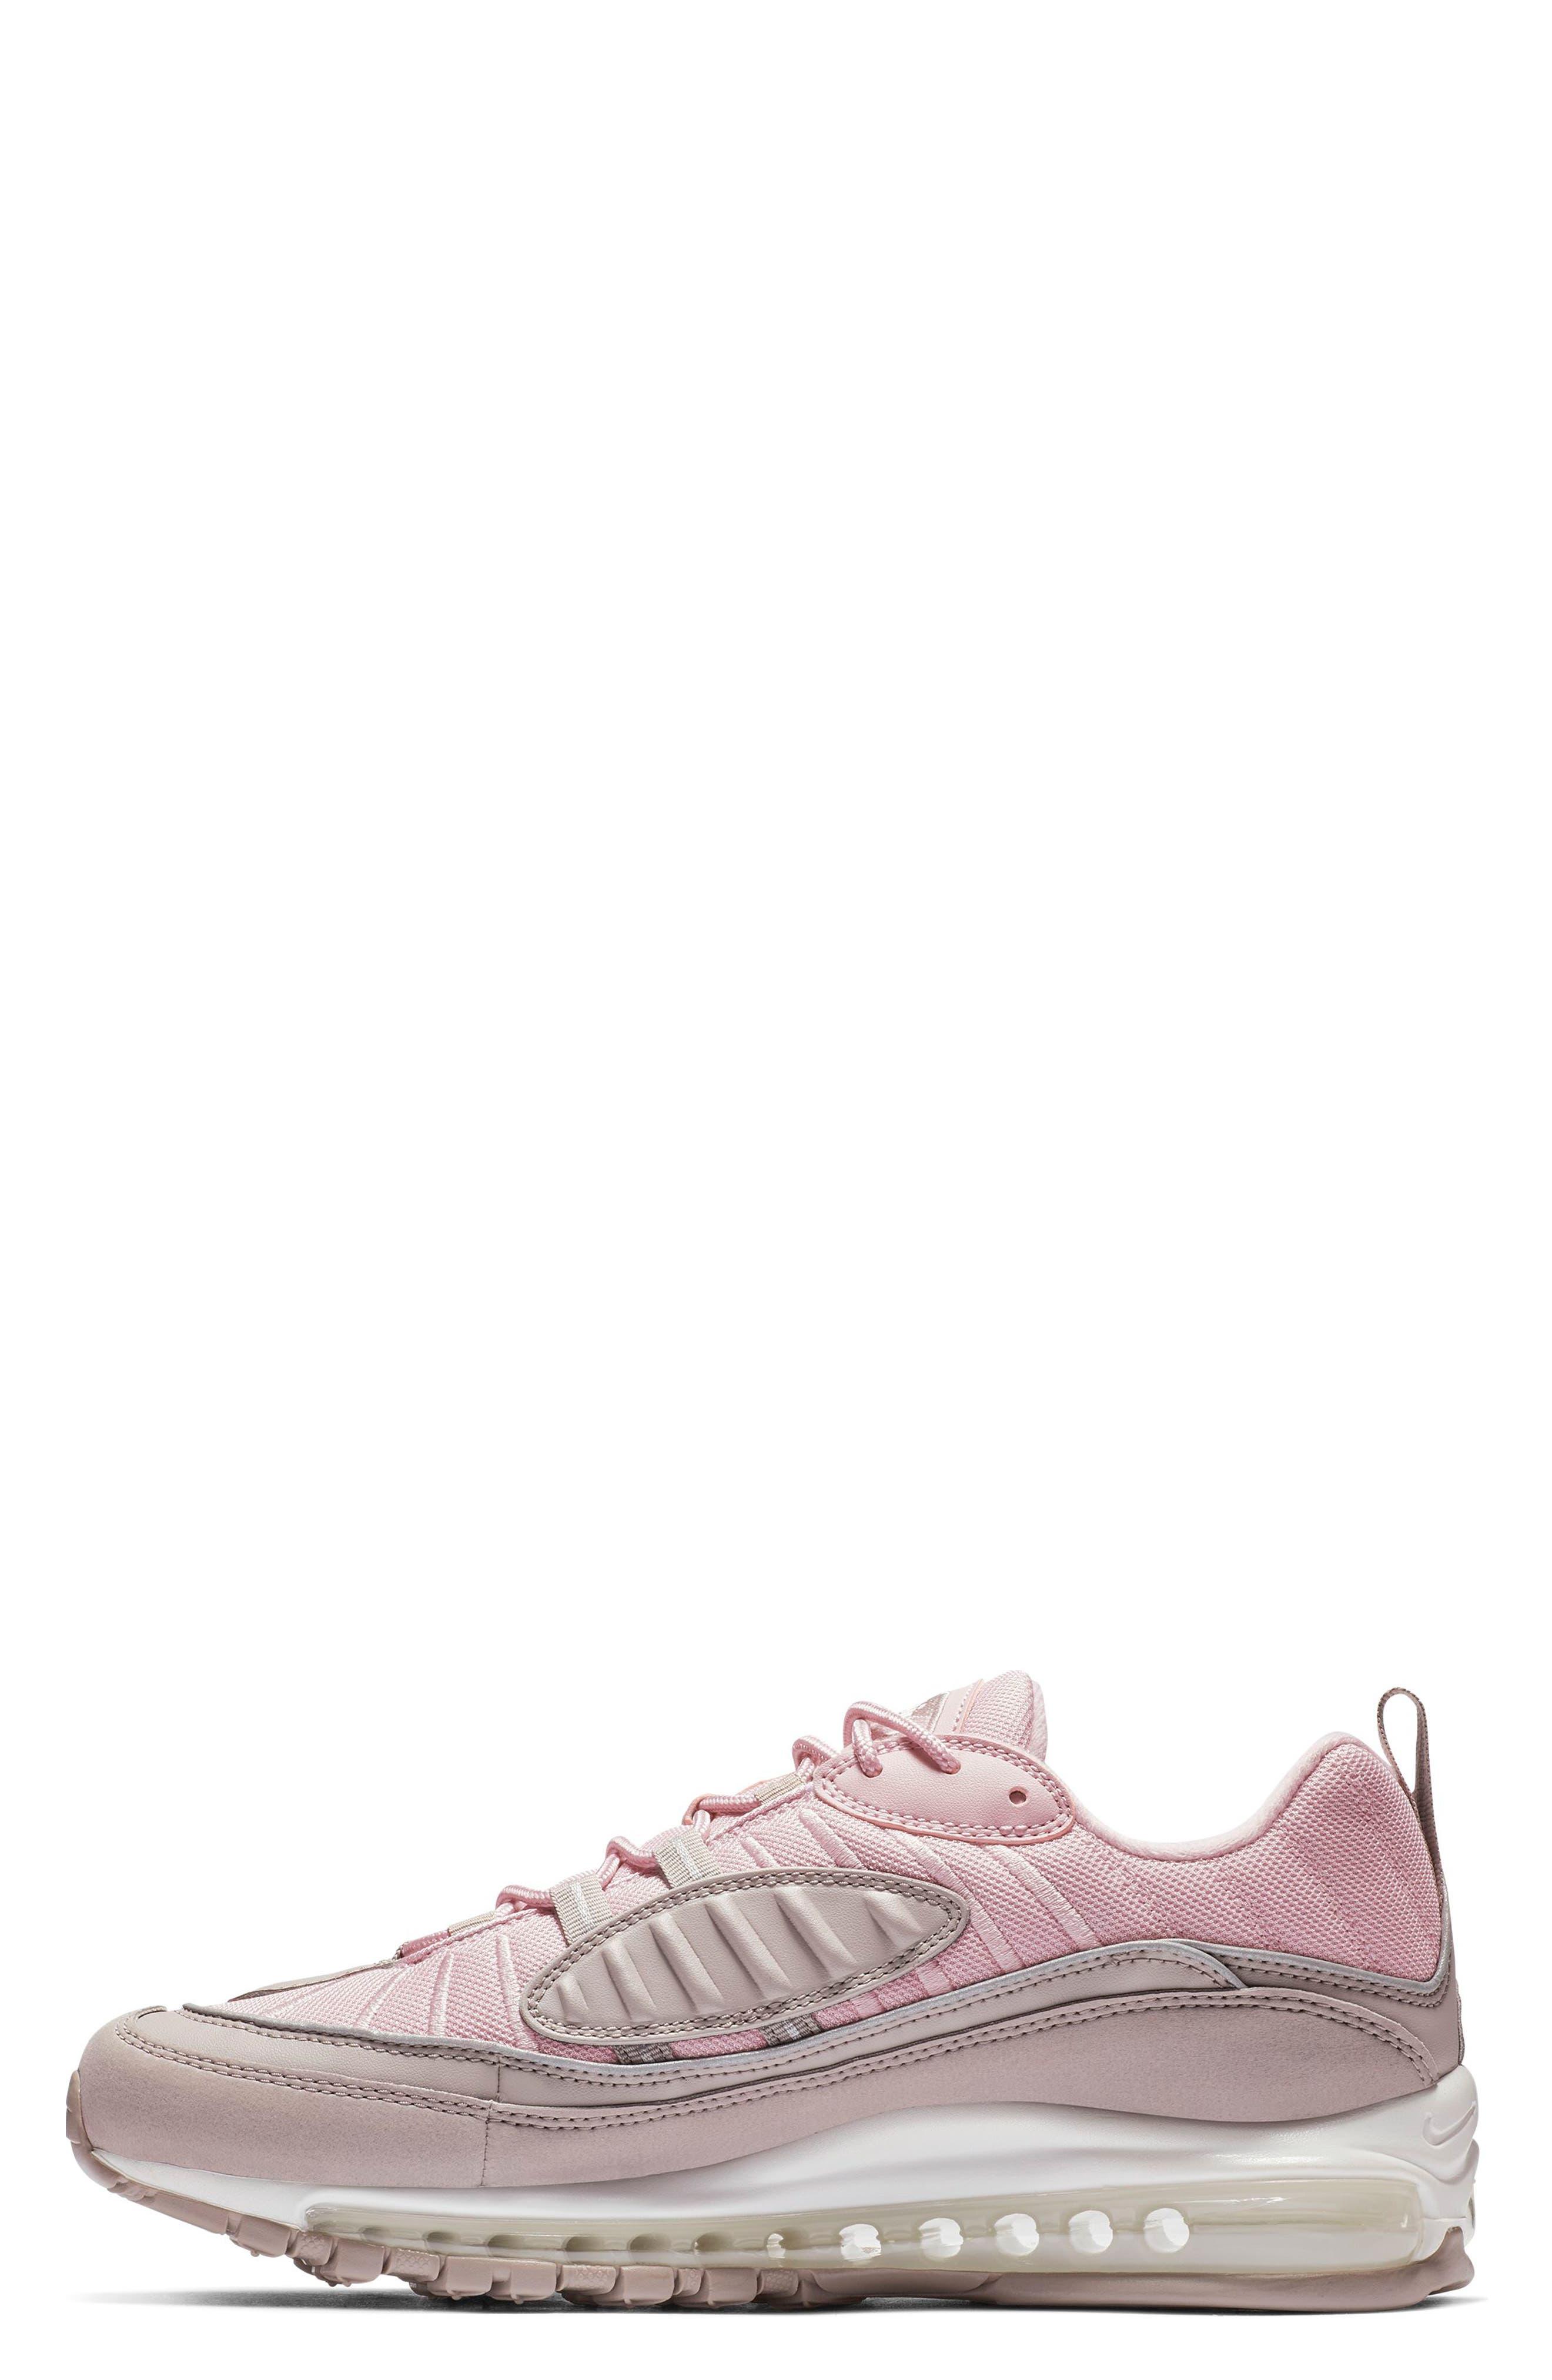 Air Max 98 Sneaker,                             Alternate thumbnail 3, color,                             PUMICE/ PLUM CHALK/ WHITE